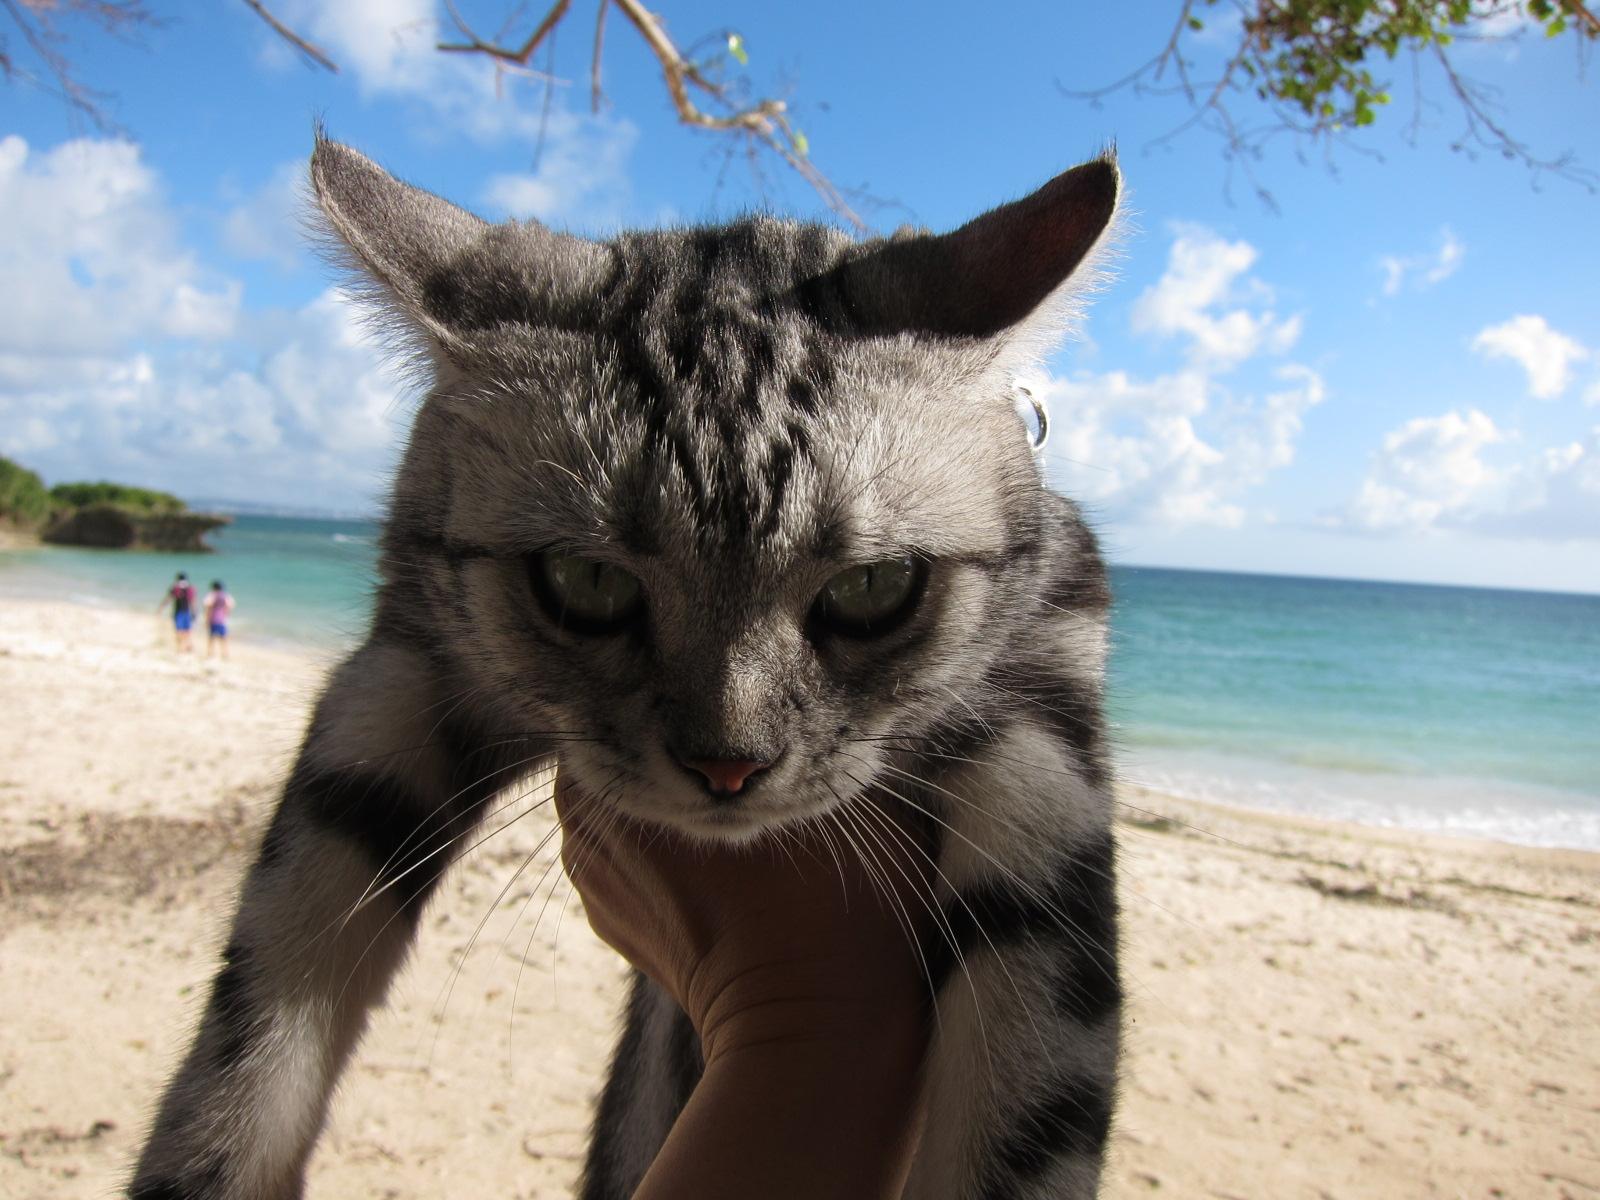 play at the beach._c0153966_17185335.jpg